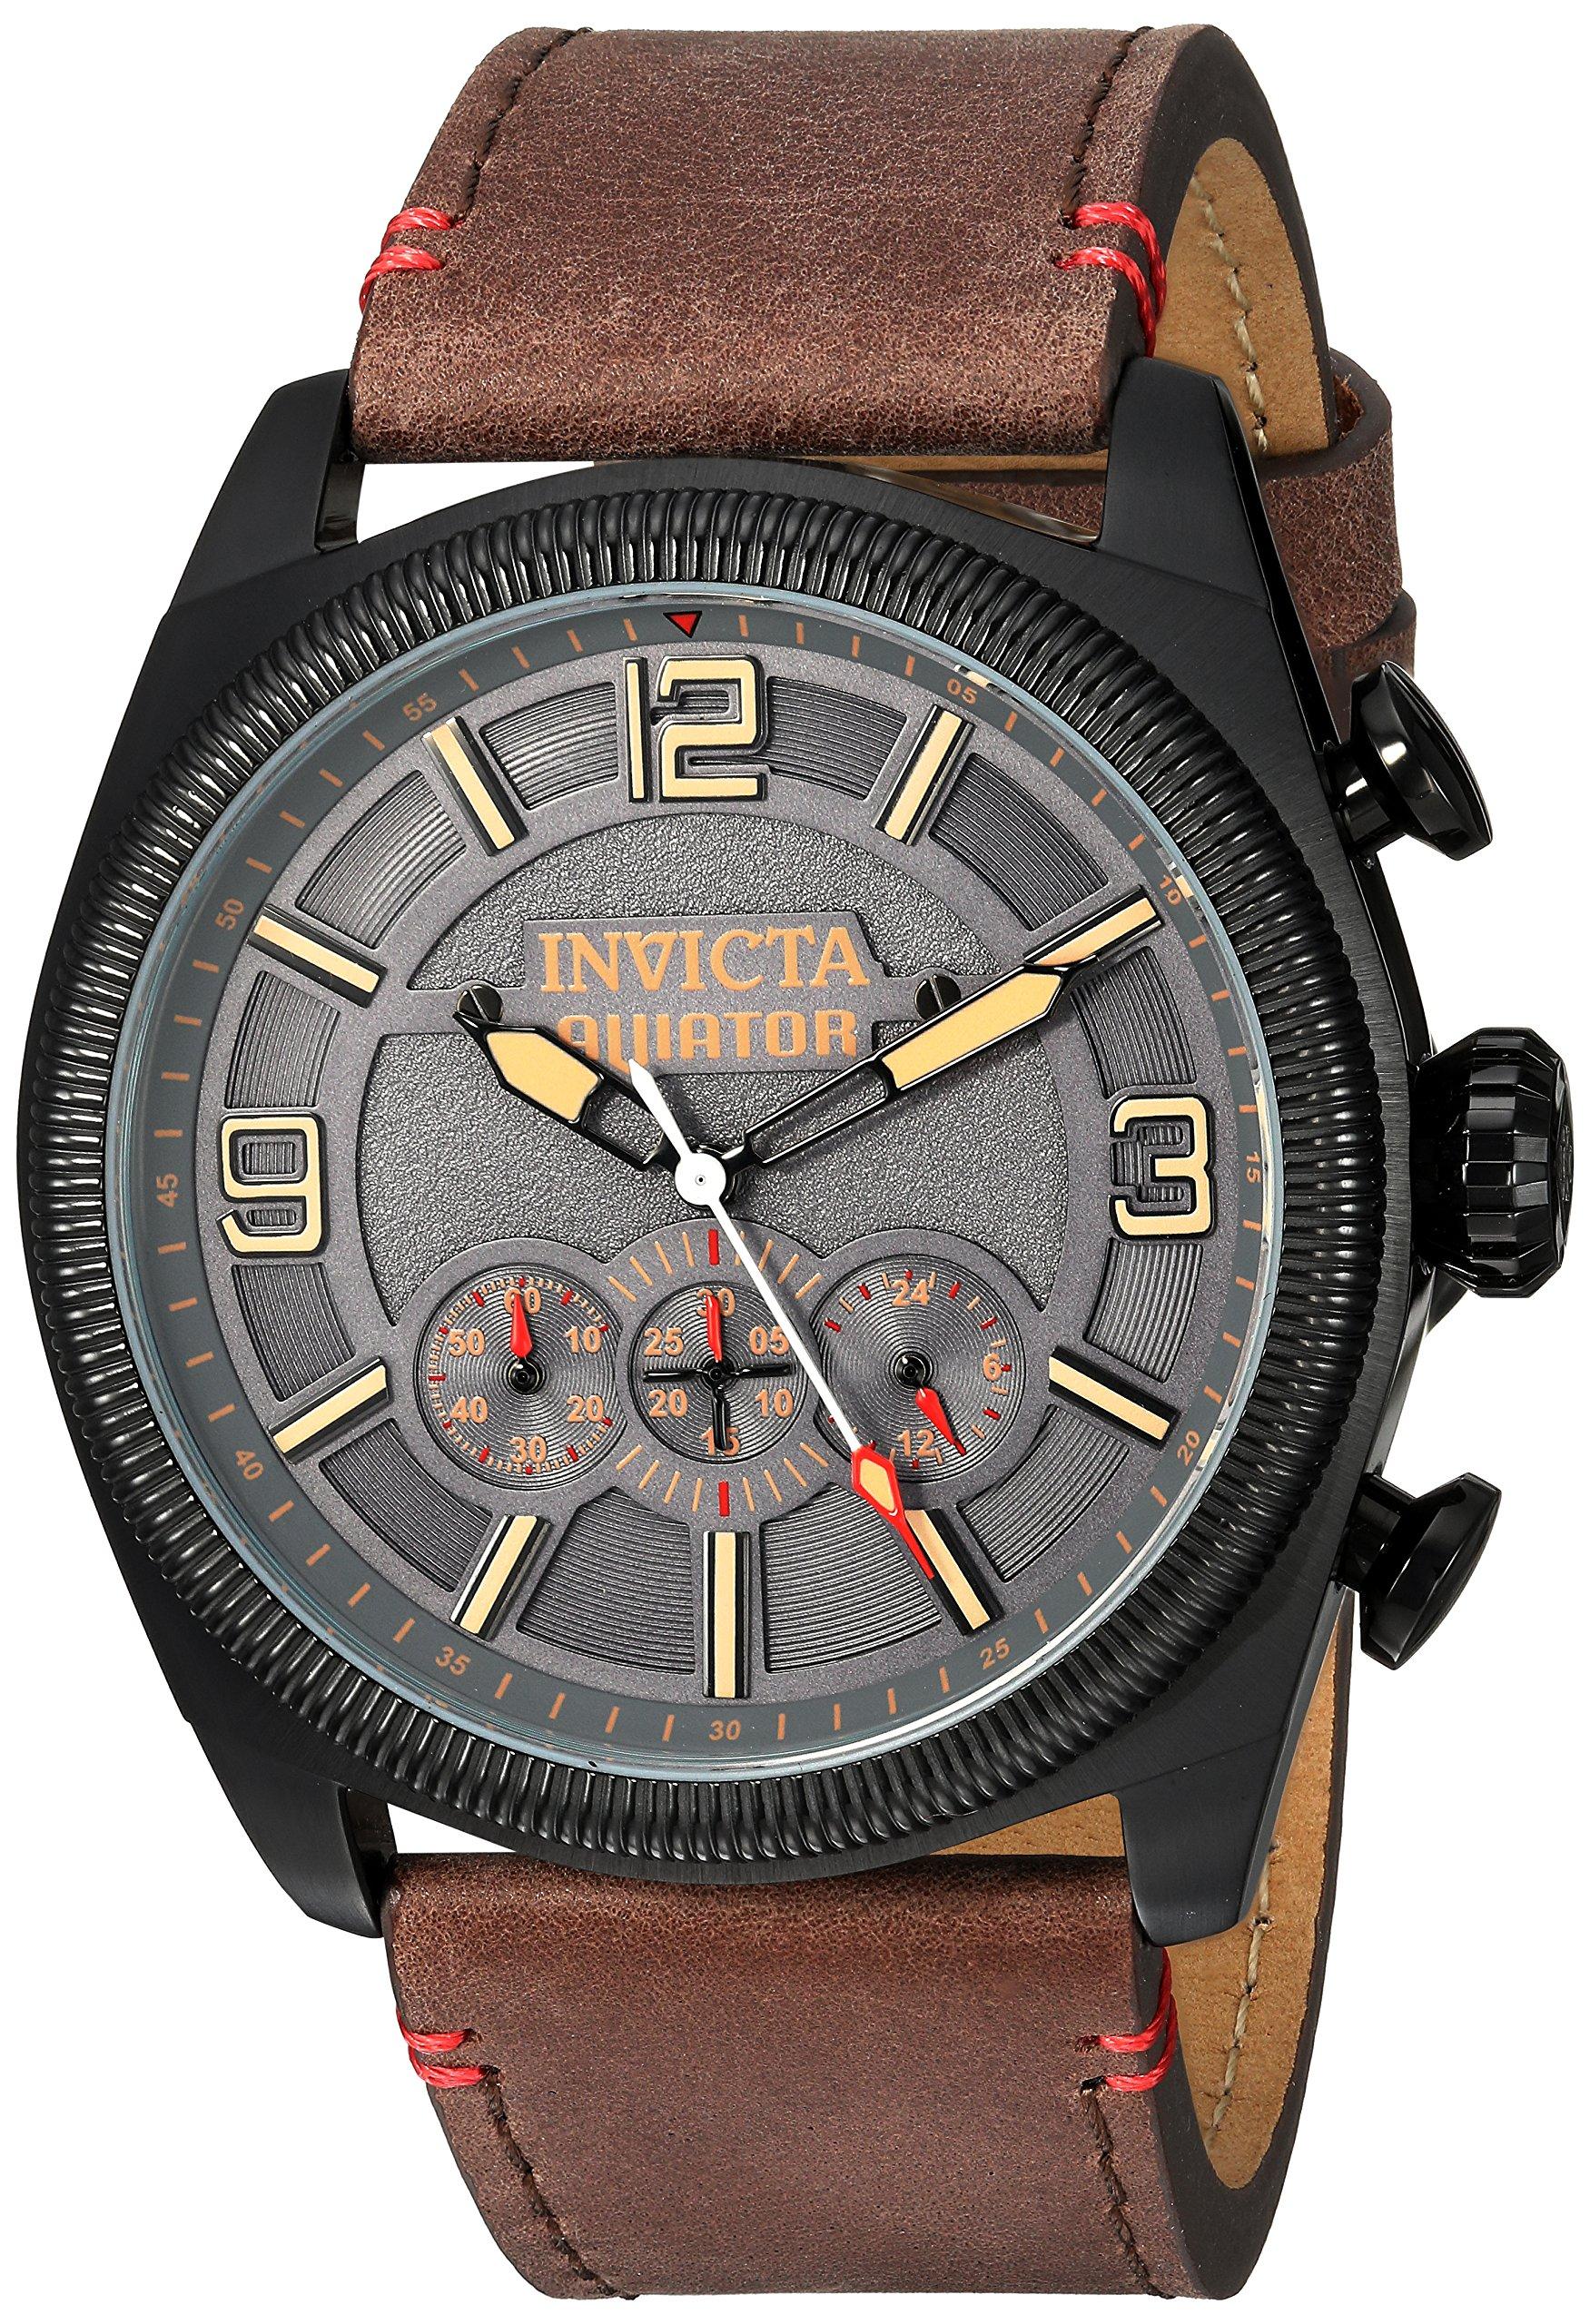 ویکالا · خرید  اصل اورجینال · خرید از آمازون · Invicta Men's 'Aviator' Quartz Stainless Steel and Leather Casual Watch, Color:Brown (Model: 22988) wekala · ویکالا